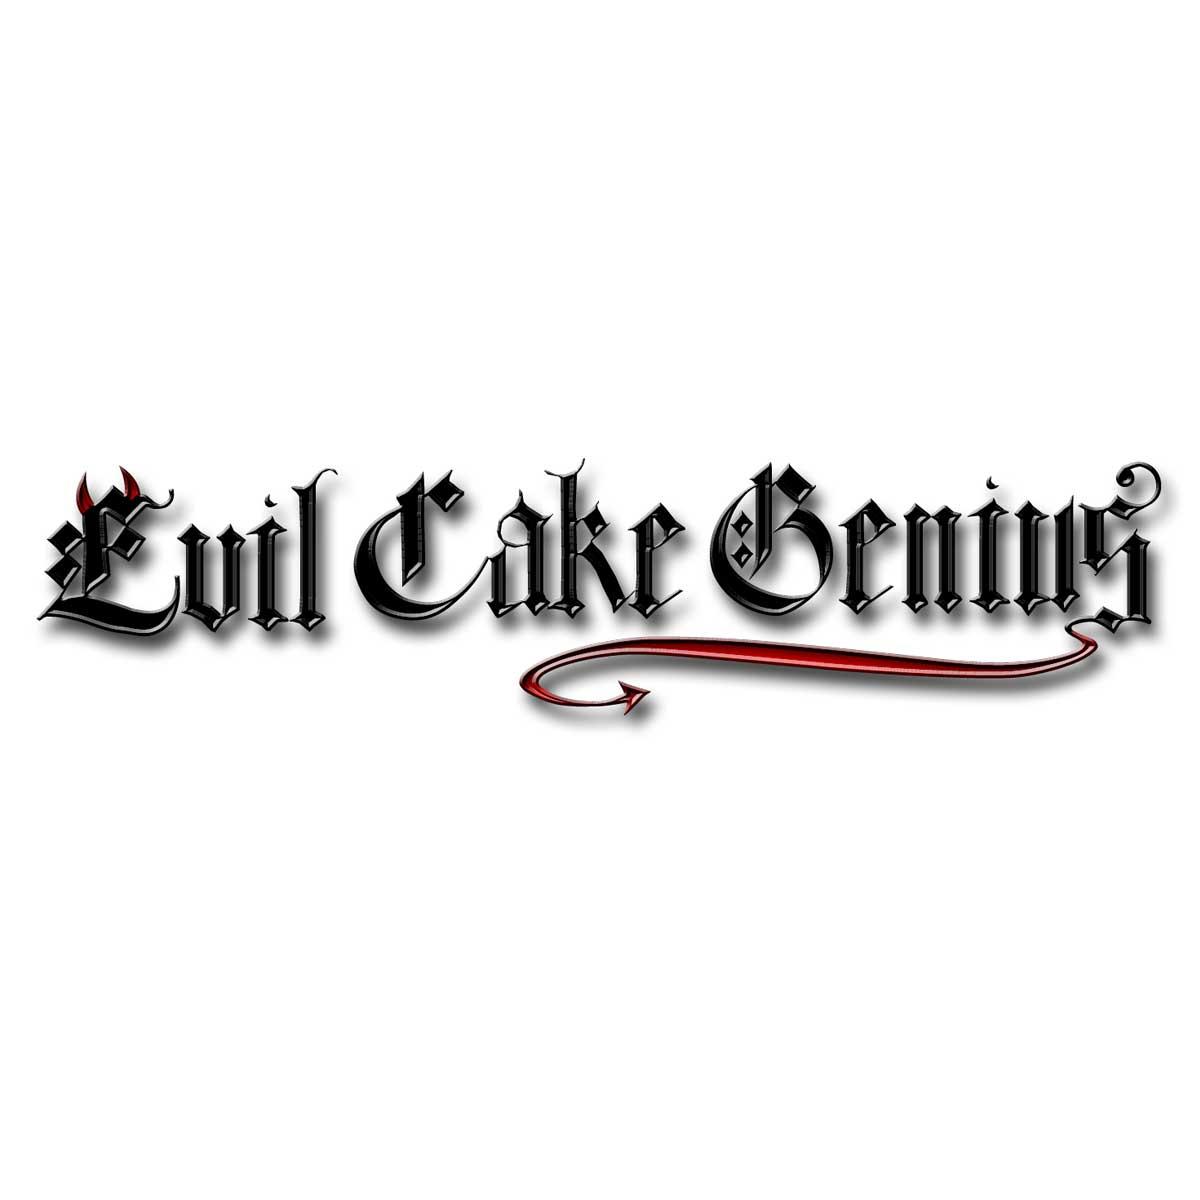 Moulds Mini Frames Set of 4 - Evil Cake Genius